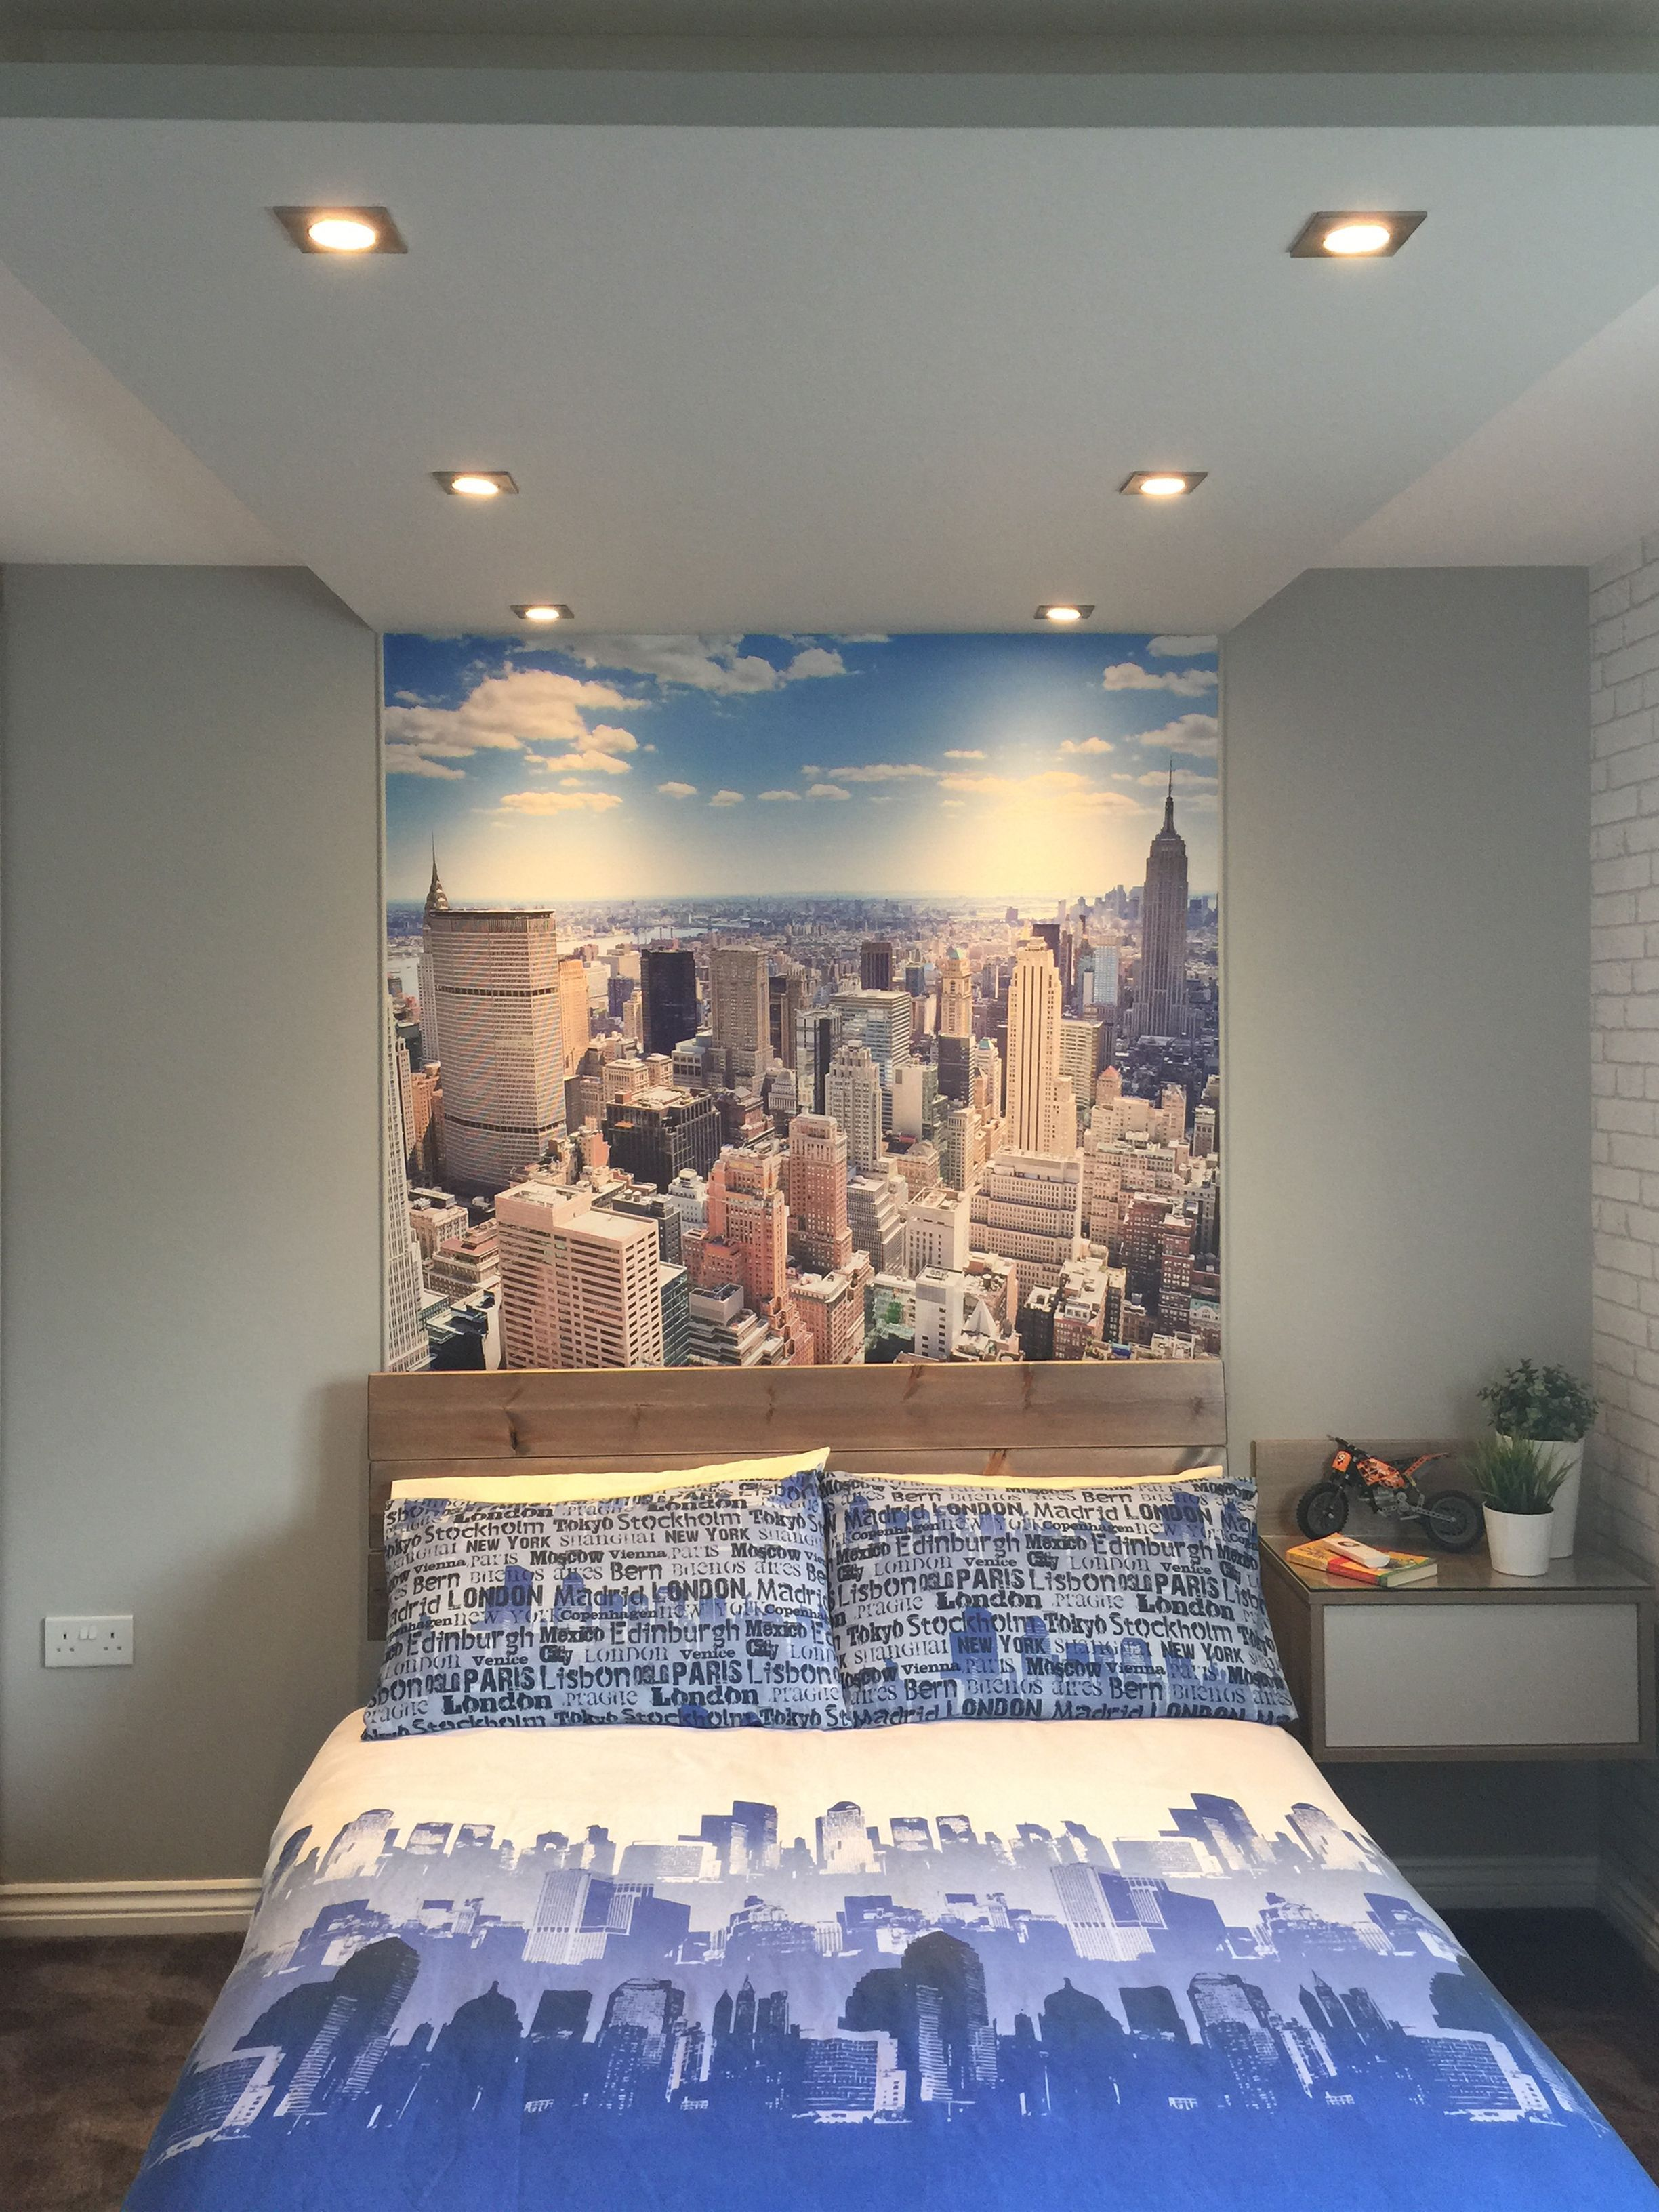 Sunny New York Wallpaper Mural Murals Wallpaper In 2020 City